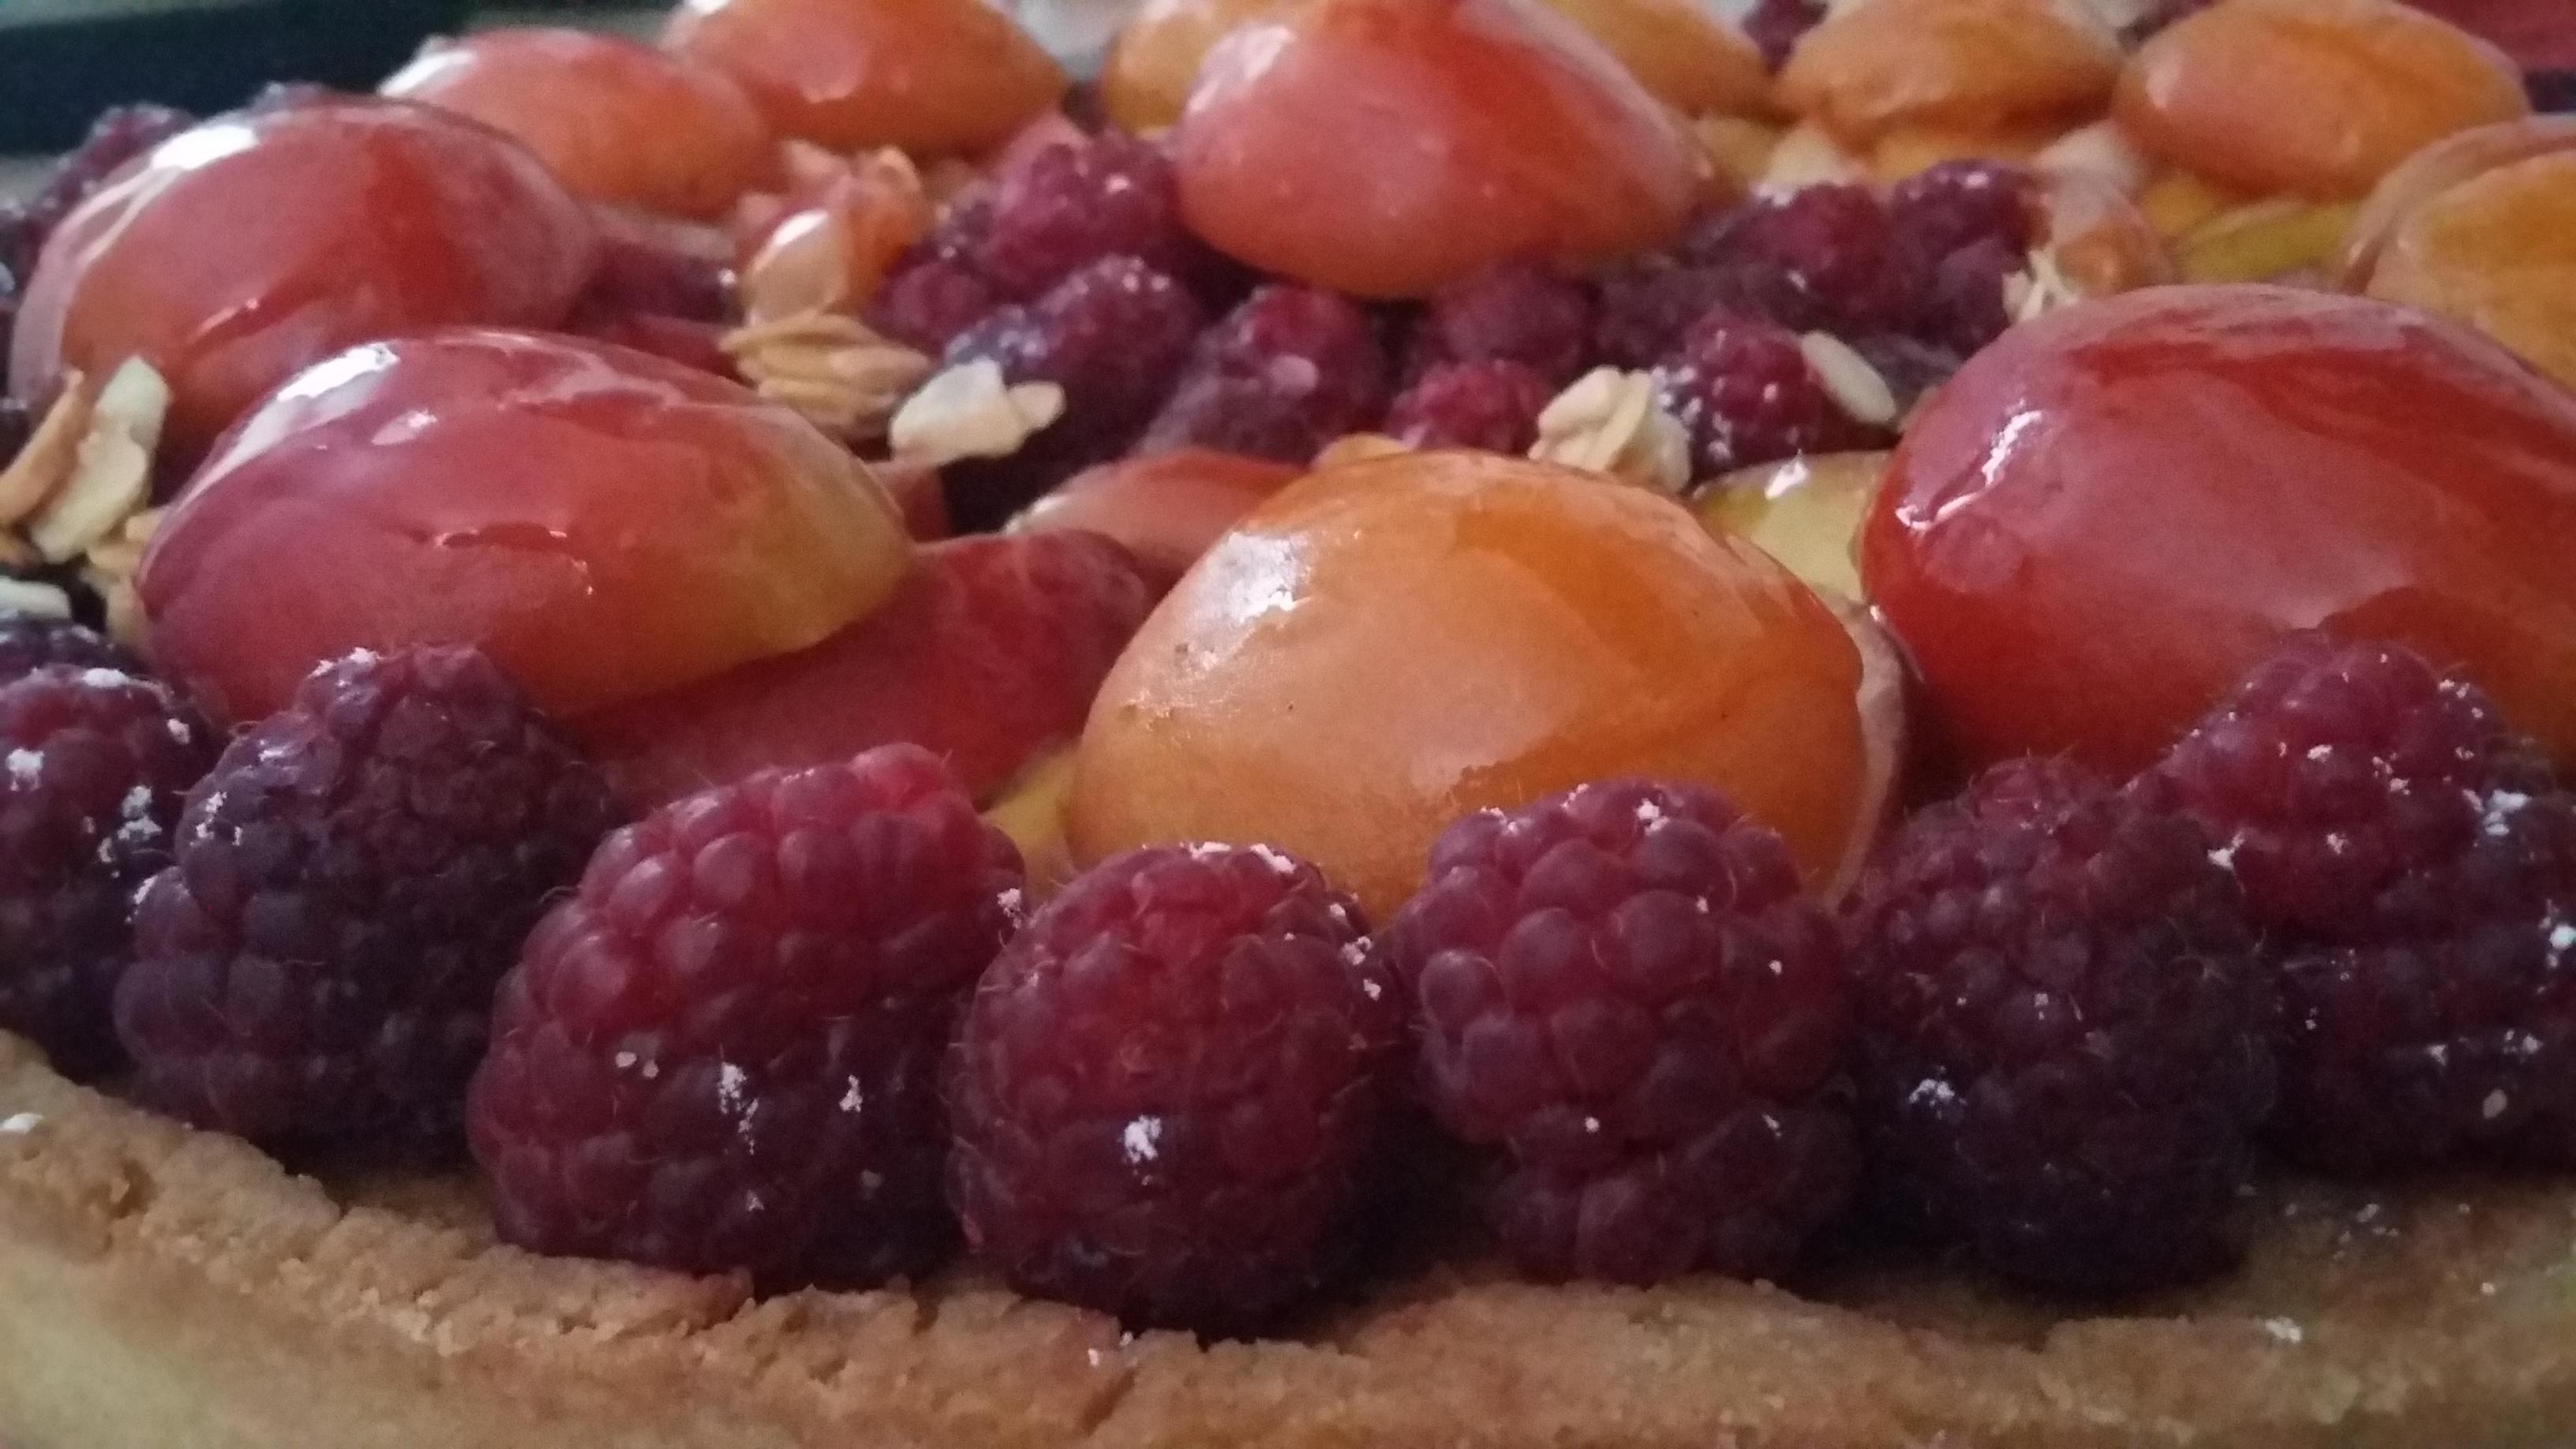 tartefruits-1458394215.jpg